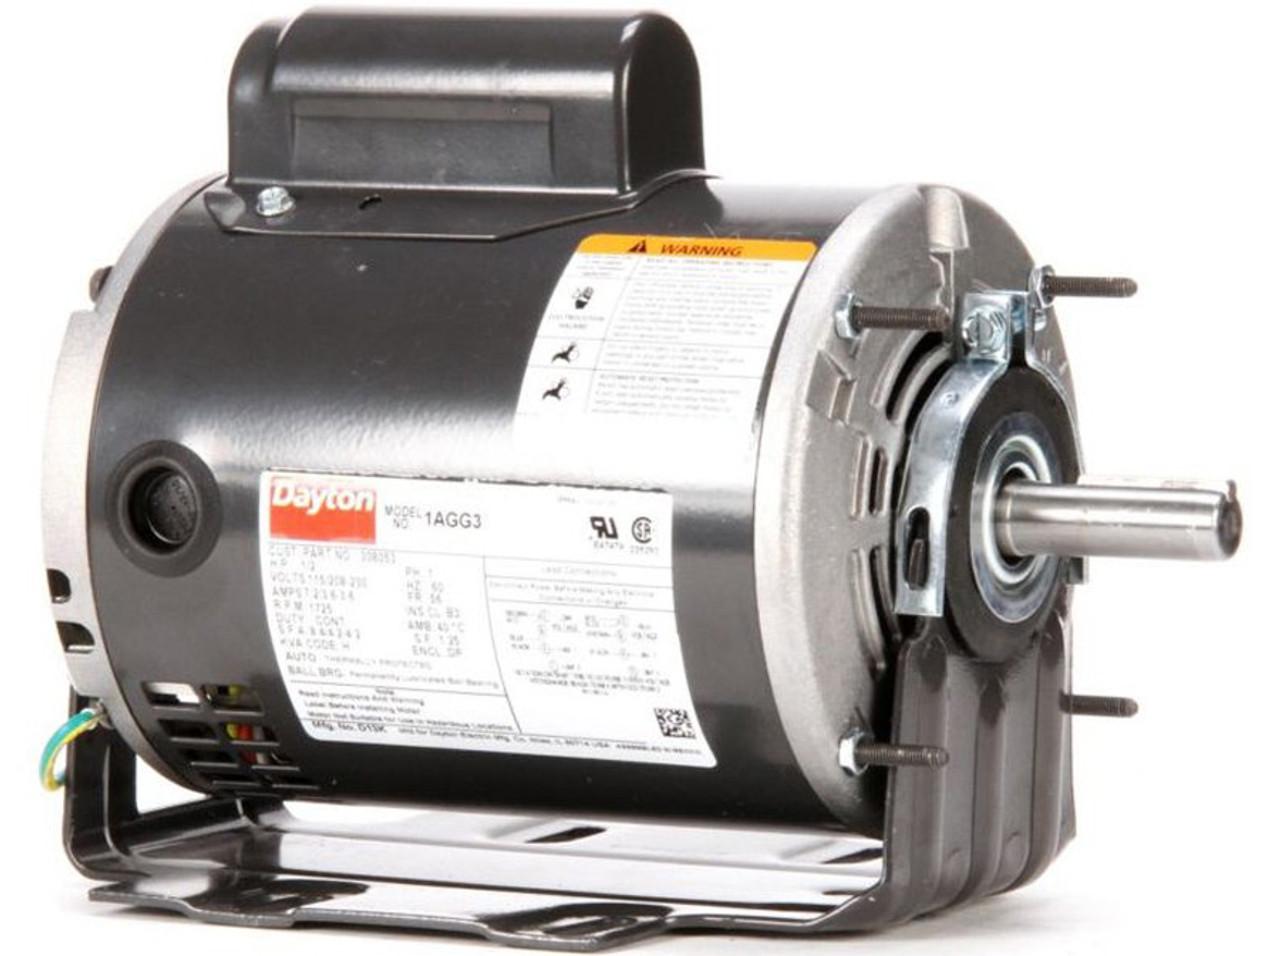 1/2 hp Belt Drive Blower Cap Start Motor 1725 RPM 115/208-230V Dayton Dayton Unit Heater Wiring Diagram Uf on